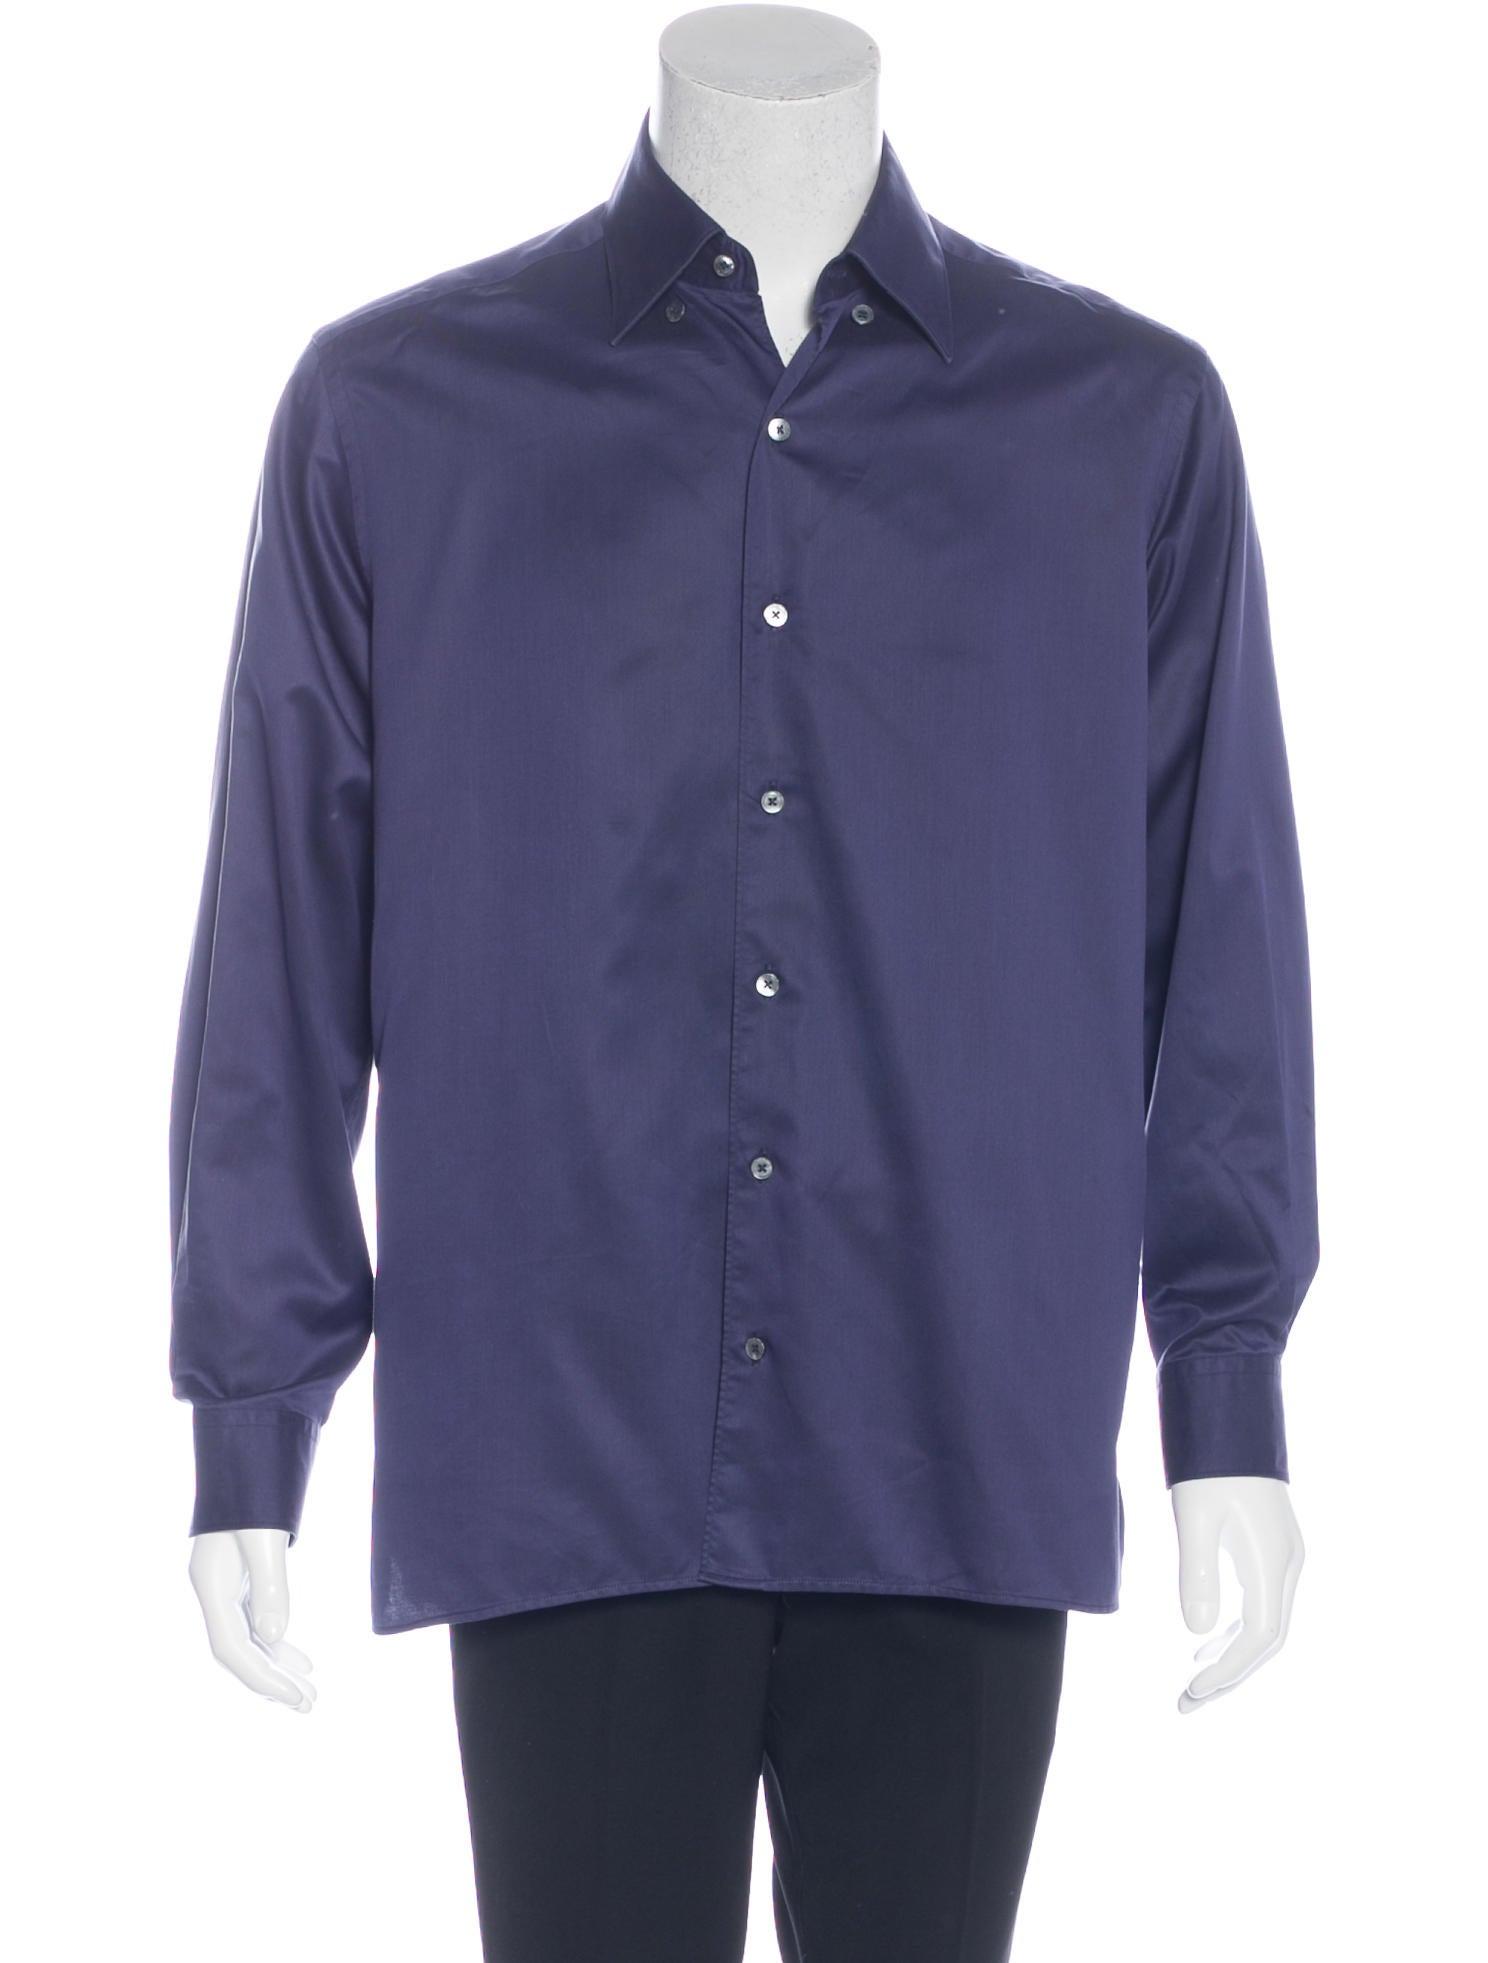 ermenegildo zegna woven dress shirt clothing zgn24913 the realreal. Black Bedroom Furniture Sets. Home Design Ideas